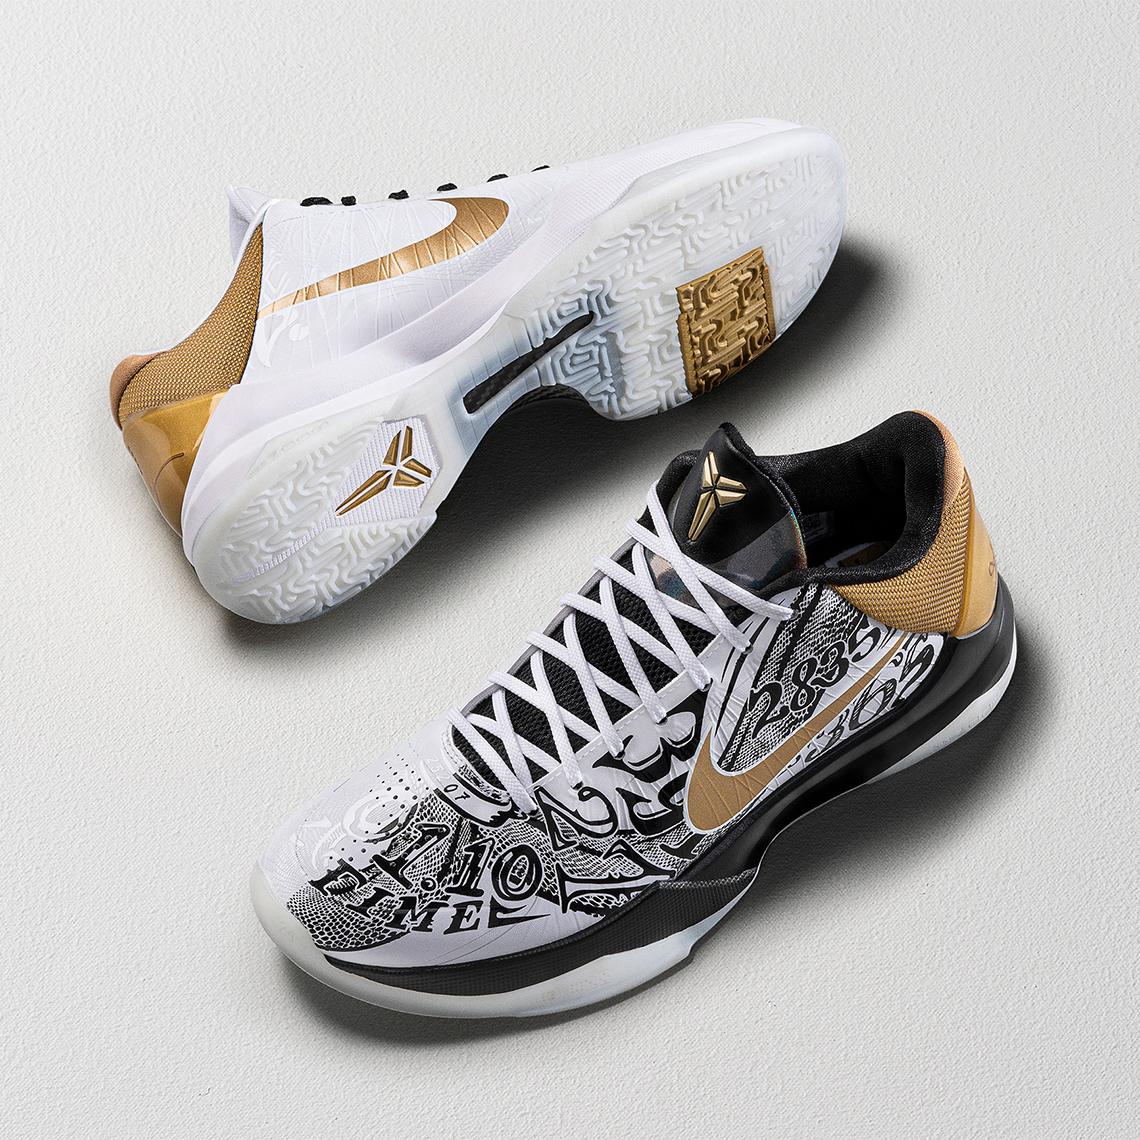 Nike Mamba Week - Kobe 5 Protro Release